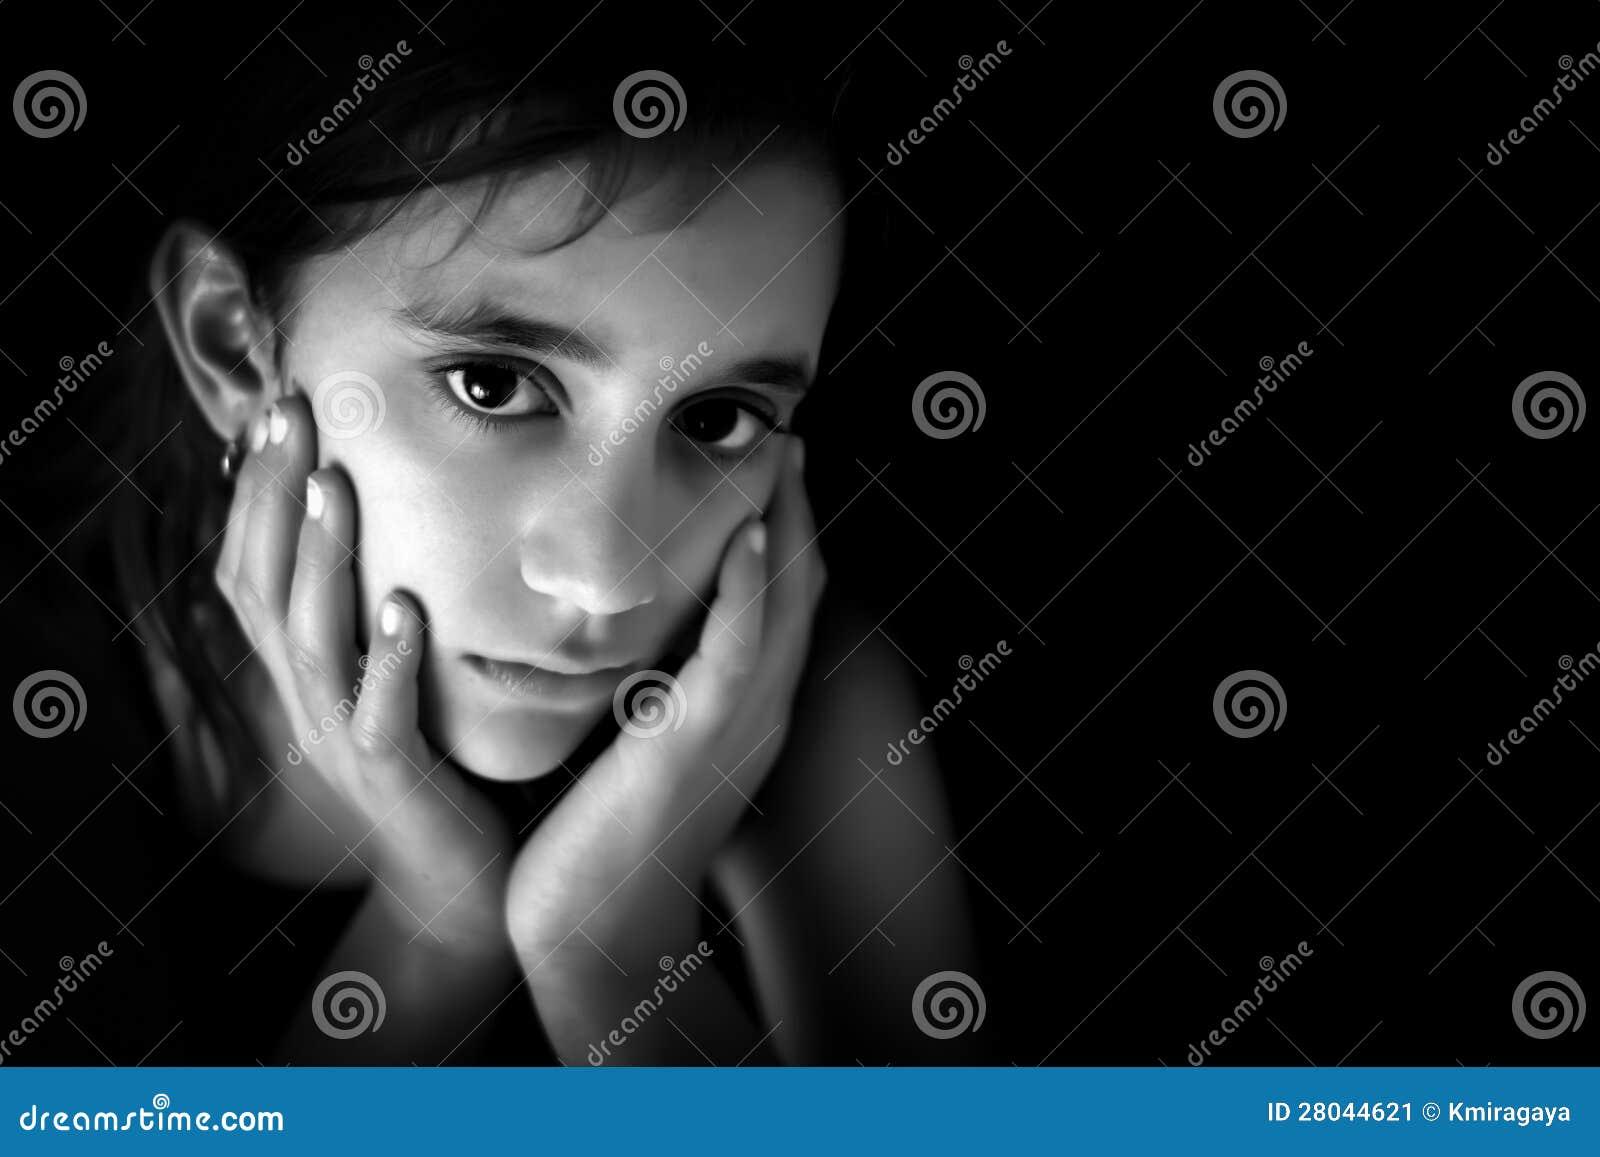 Muchacha hispánica triste en blanco y negro